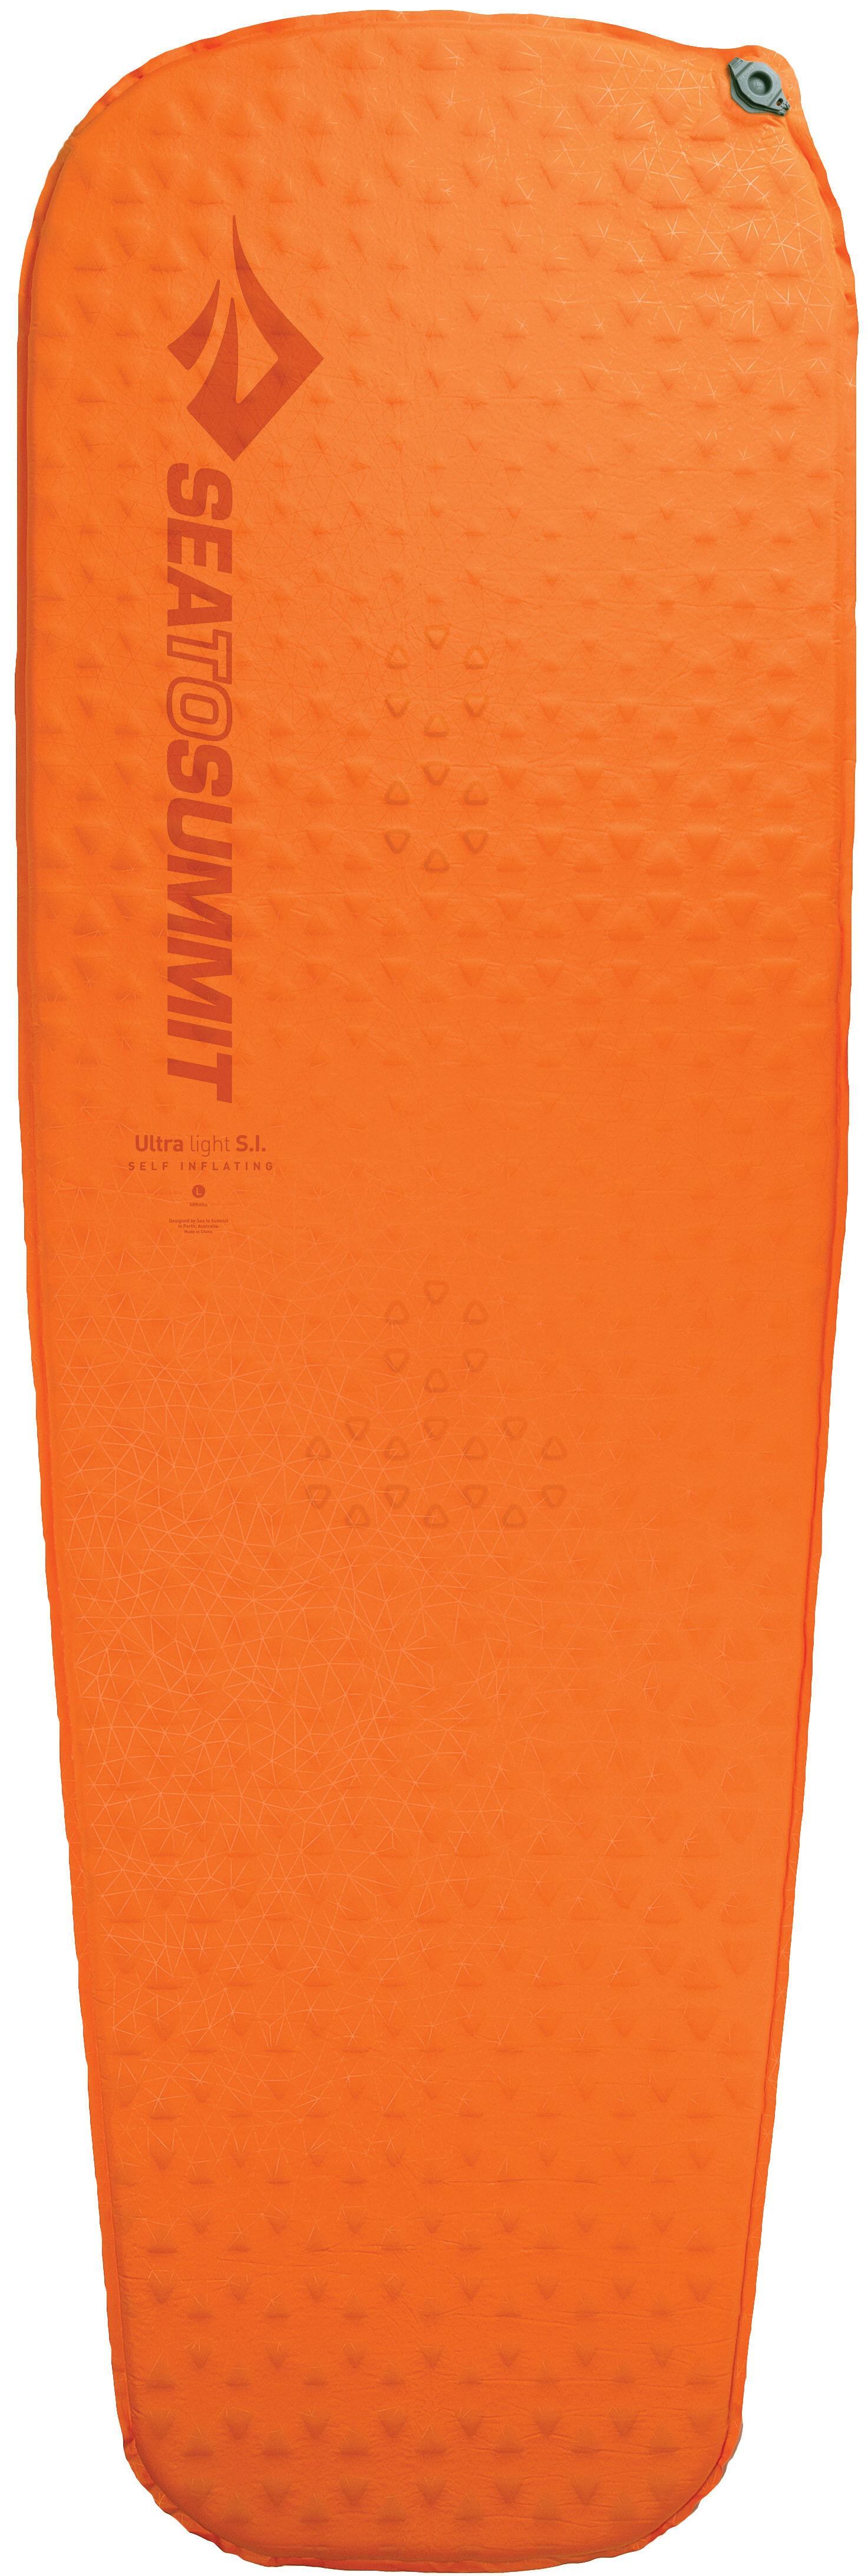 Sea To Summit Ultralight S I Sleeping Mats Large Orange